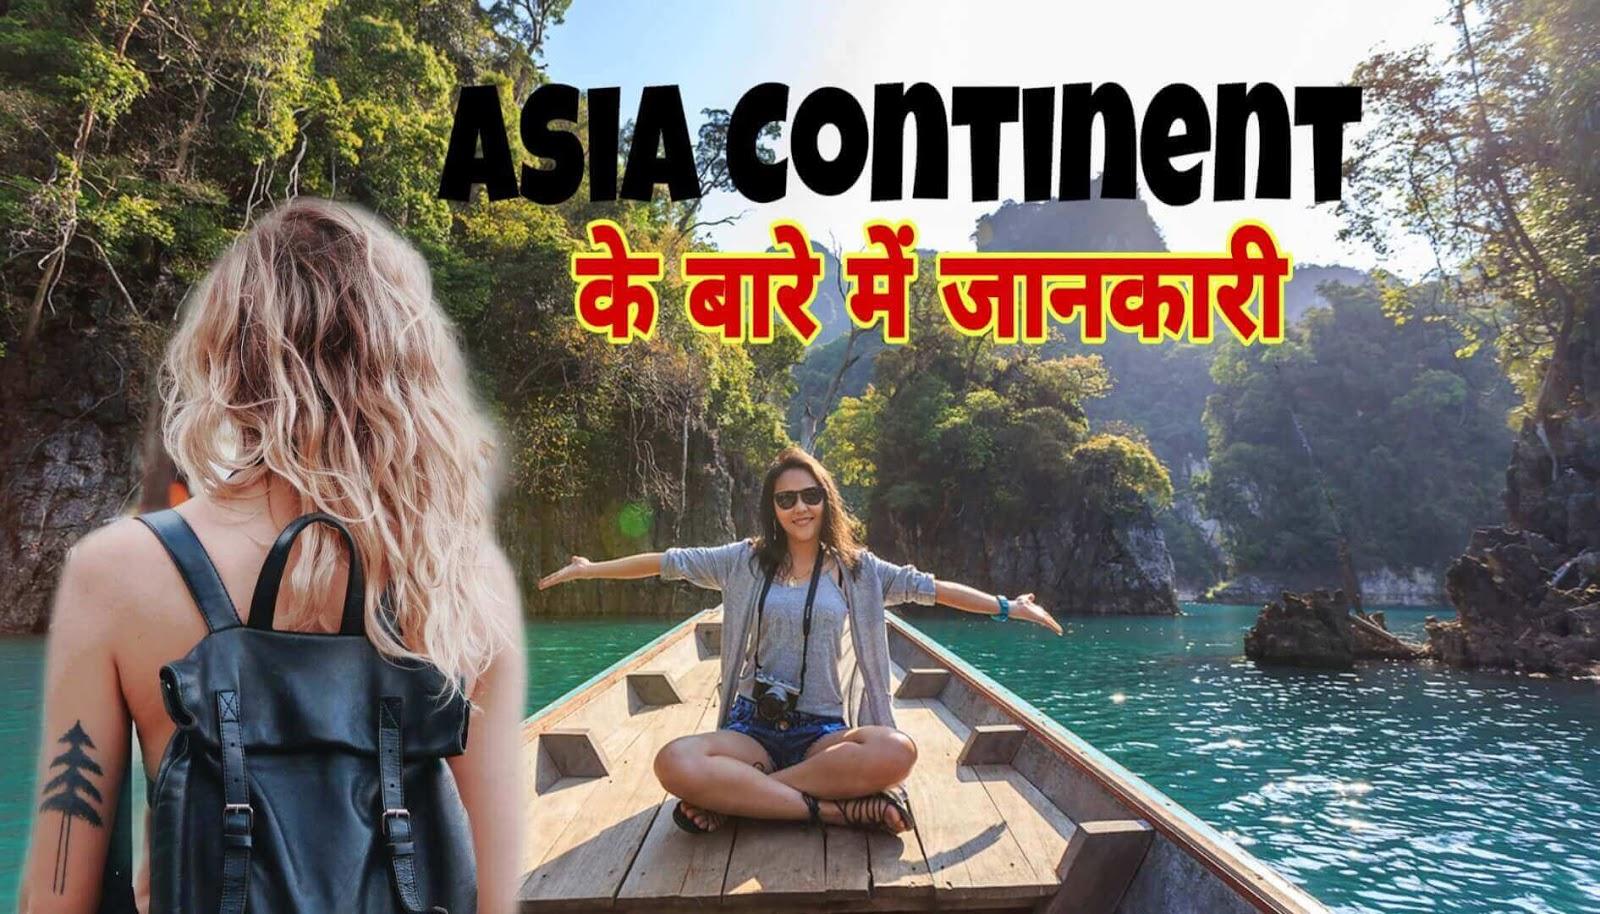 Amazing Facts about Asia Continent in Hindi - एशिया महाद्वीप के बारे में 20 मजेदार तथ्य